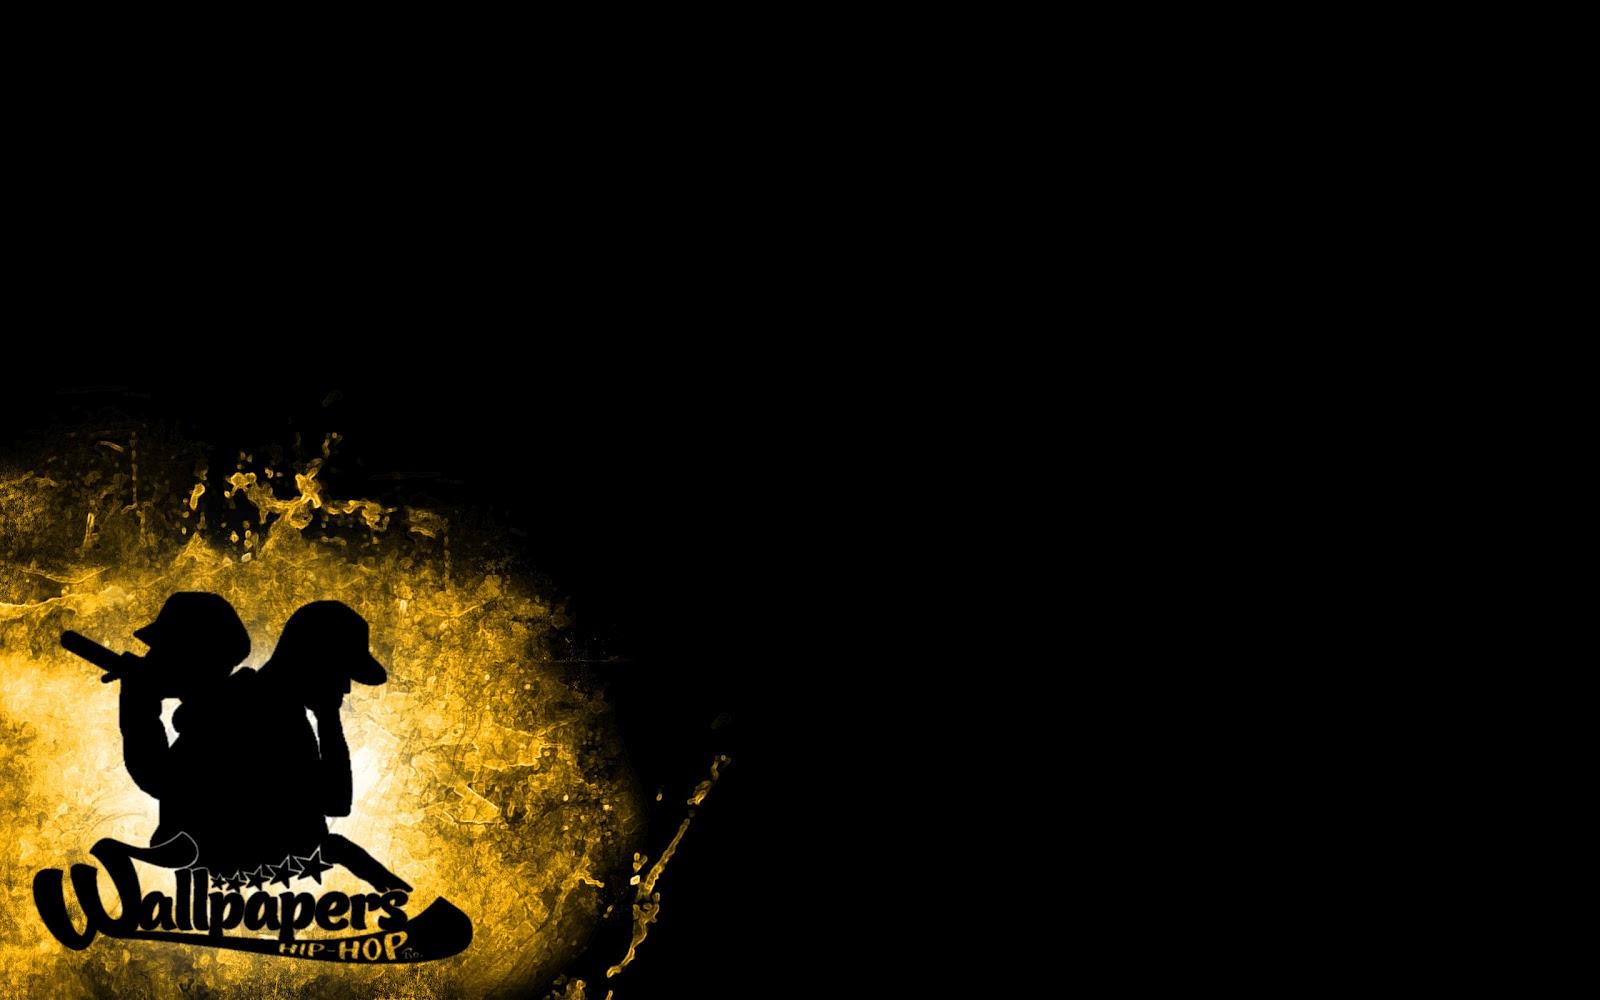 http://4.bp.blogspot.com/-nujx-UjRFMU/UBAzKBD06iI/AAAAAAAAFFo/n0Wt5E8WX6c/s1600/Wallpapers+Hip-Hop+Ro.+03..jpg